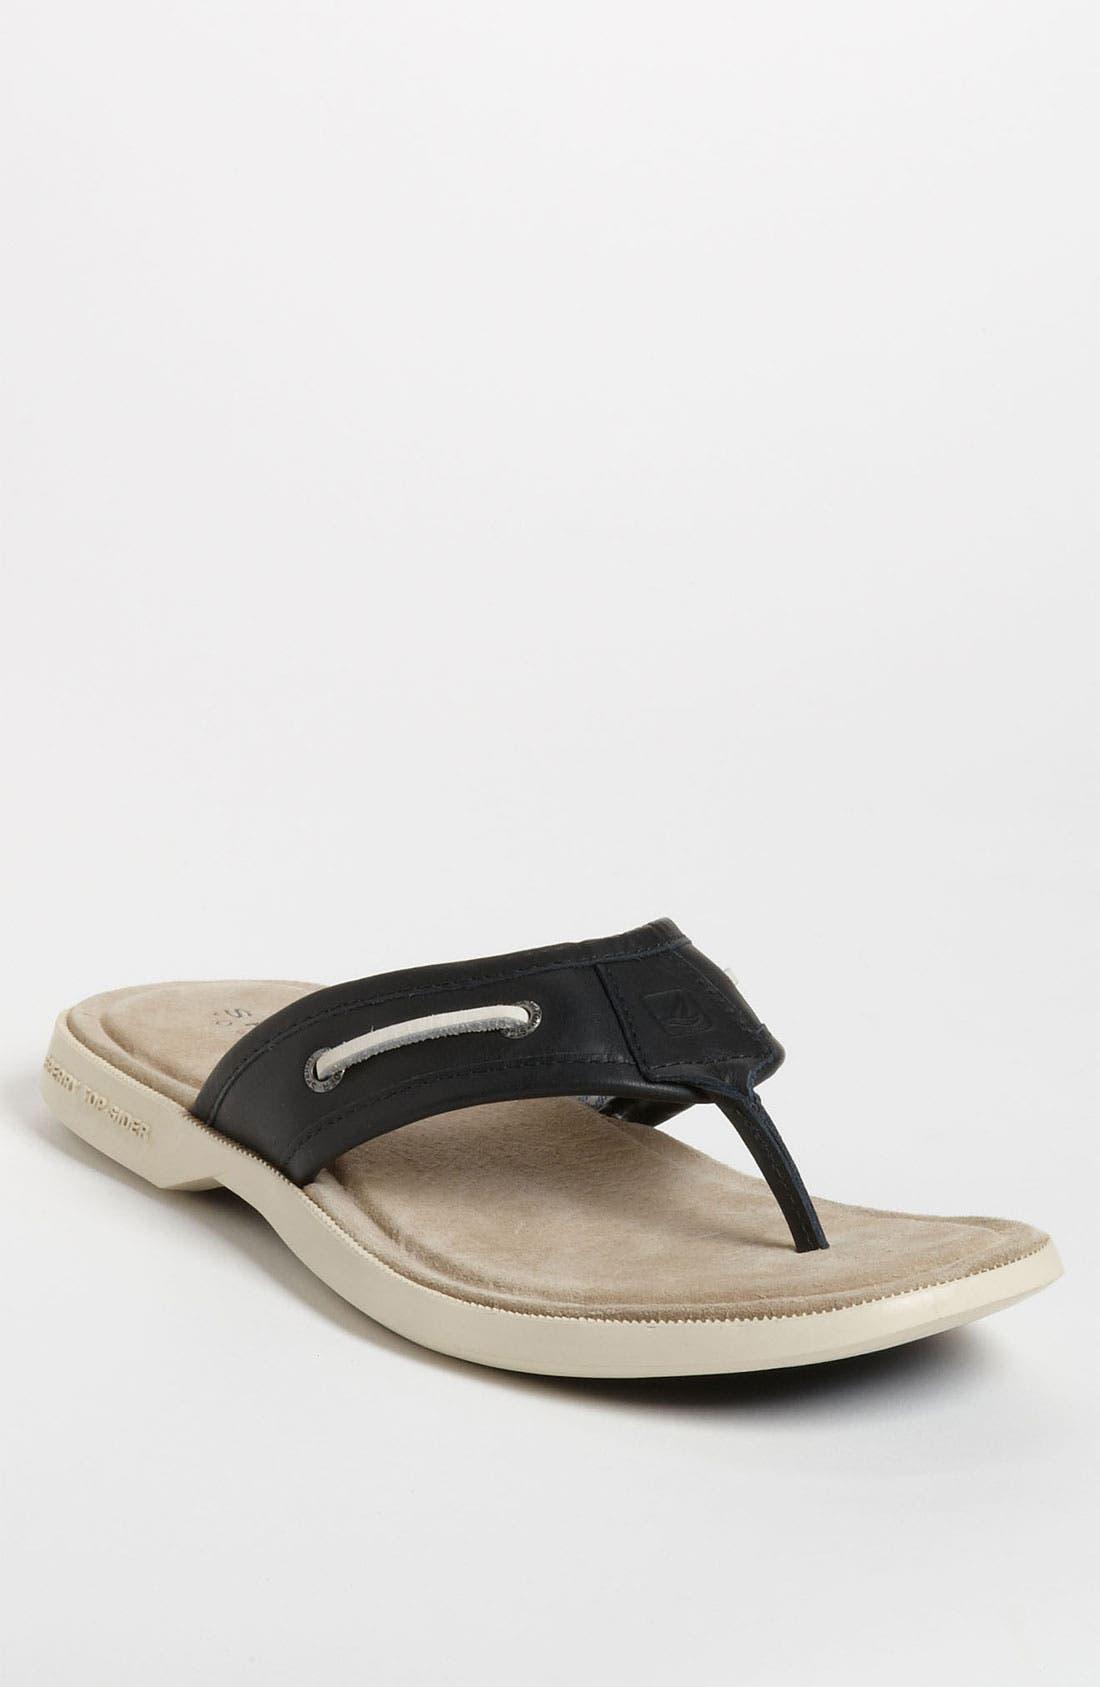 Alternate Image 1 Selected - Sperry Top-Sider® 'Sahara' Leather Sandal